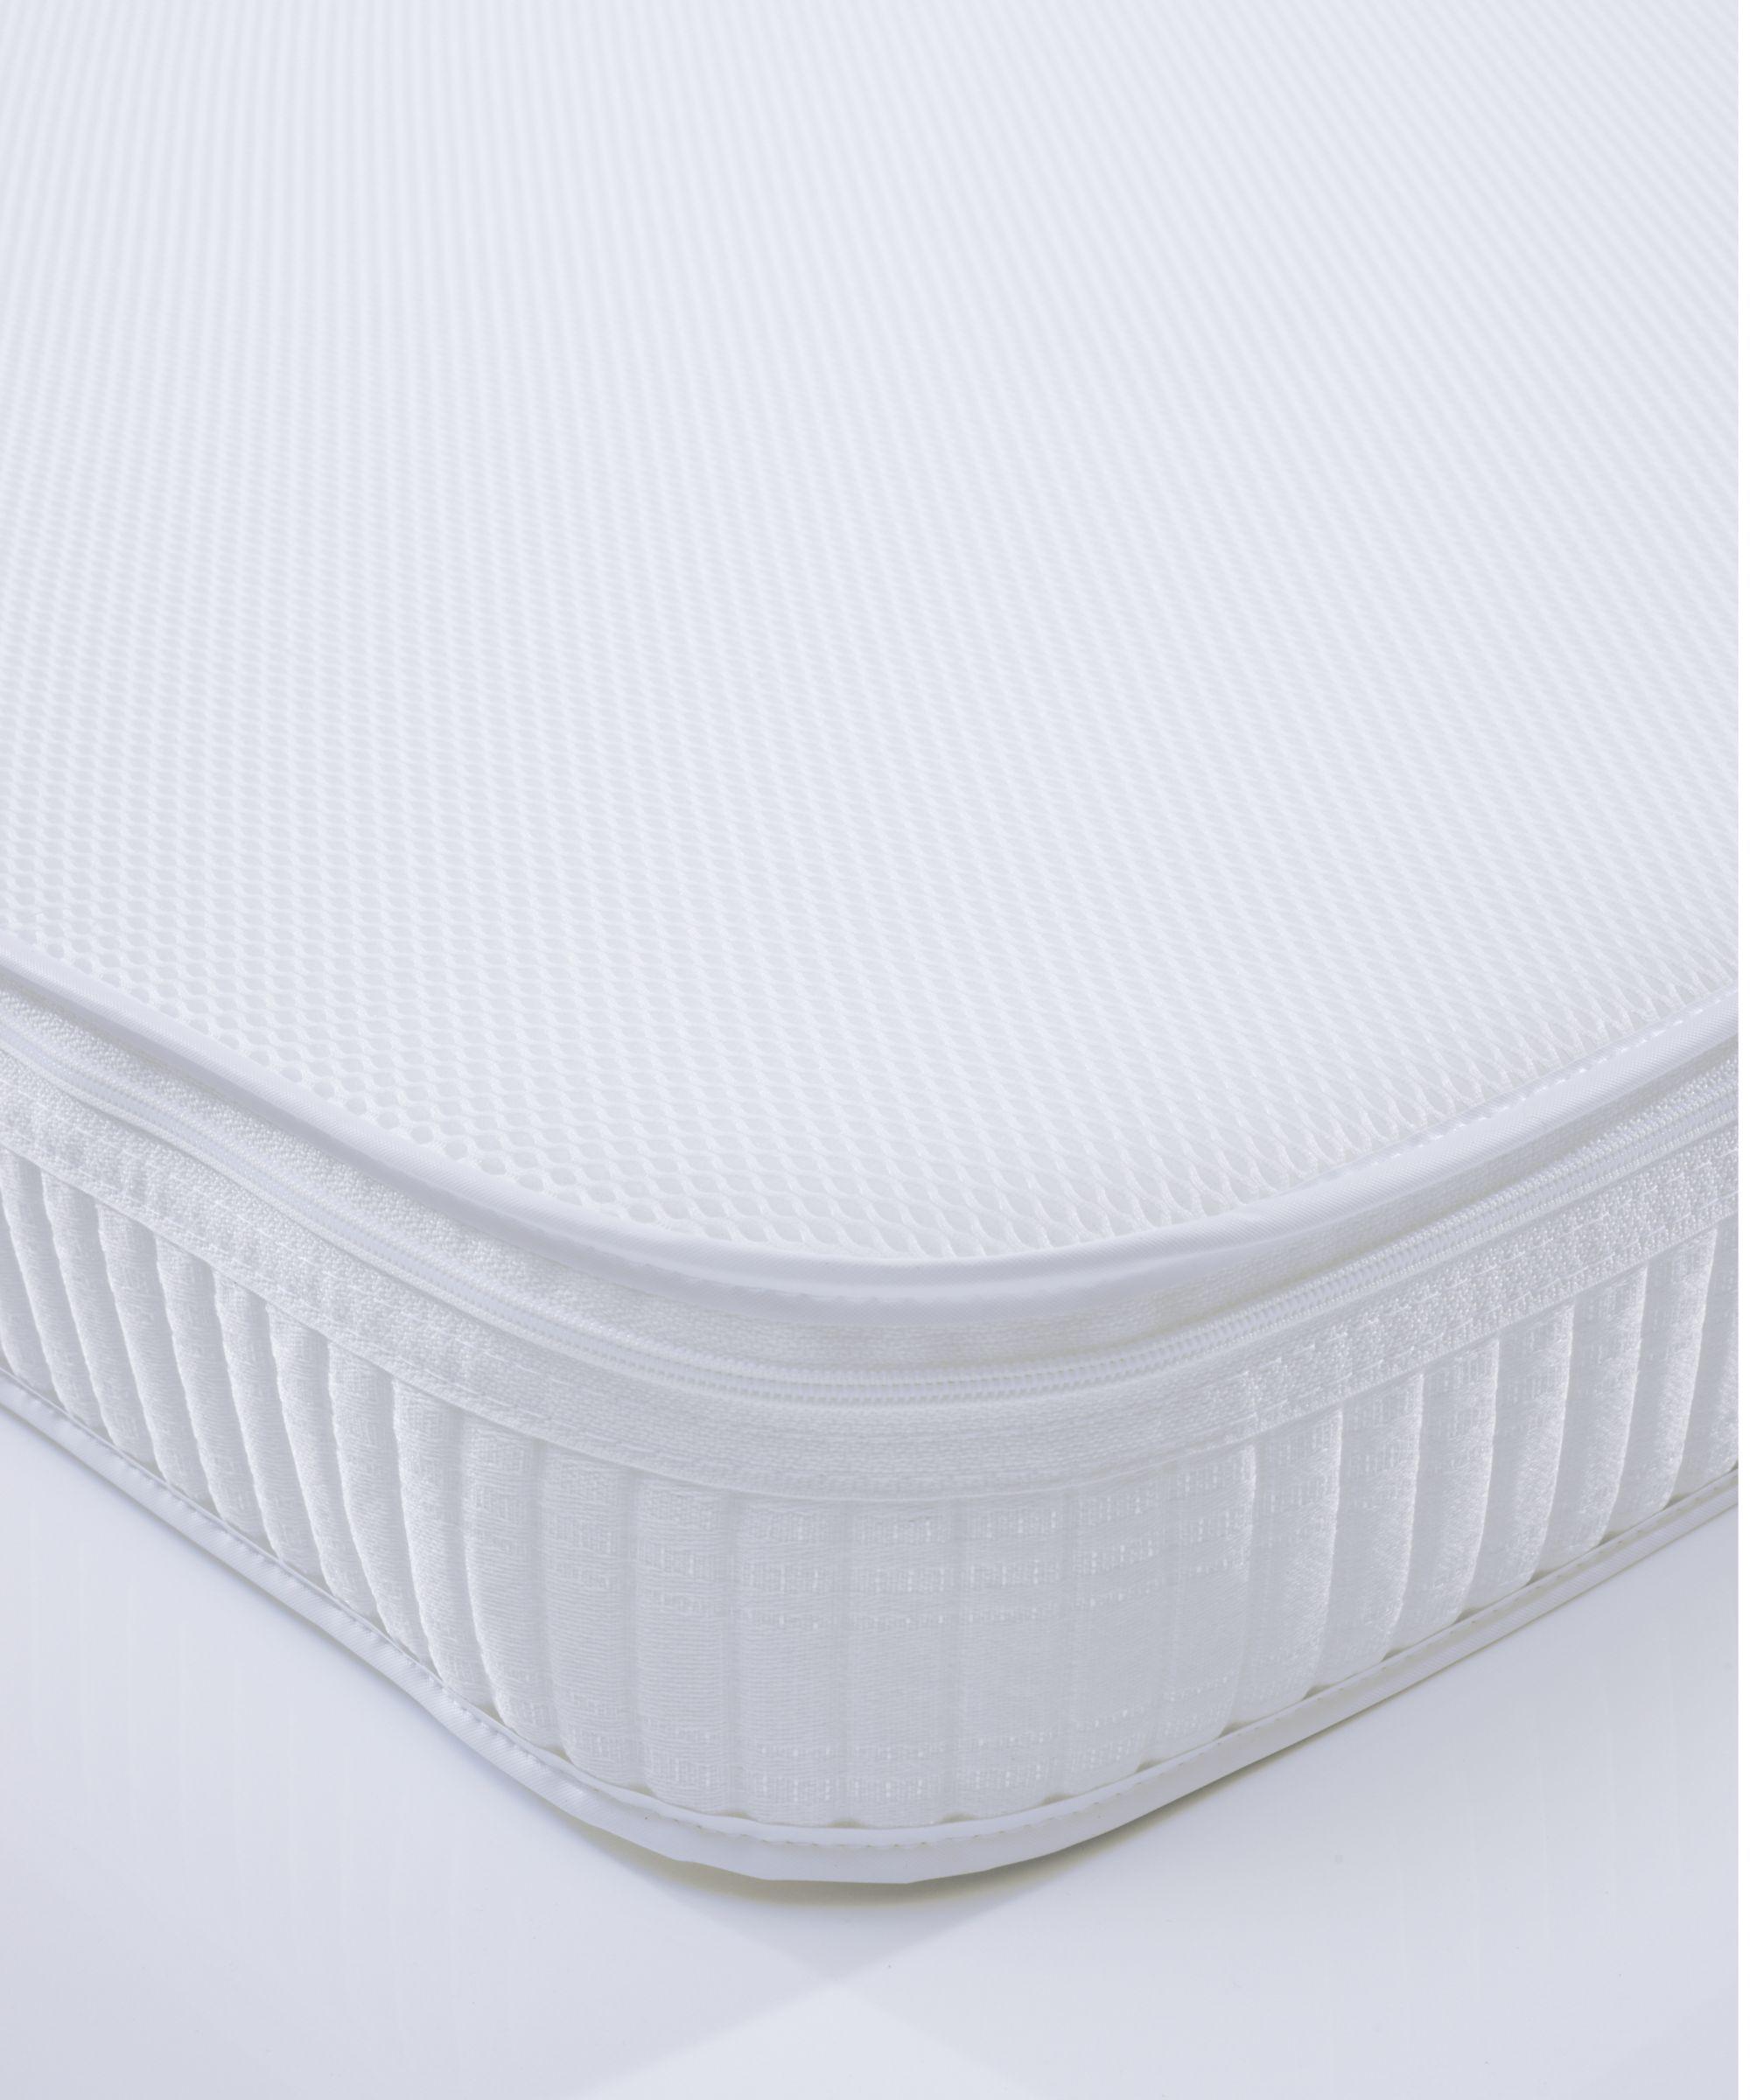 Mothercare 38 x 89cm Crib Square End SAFEseal Foam